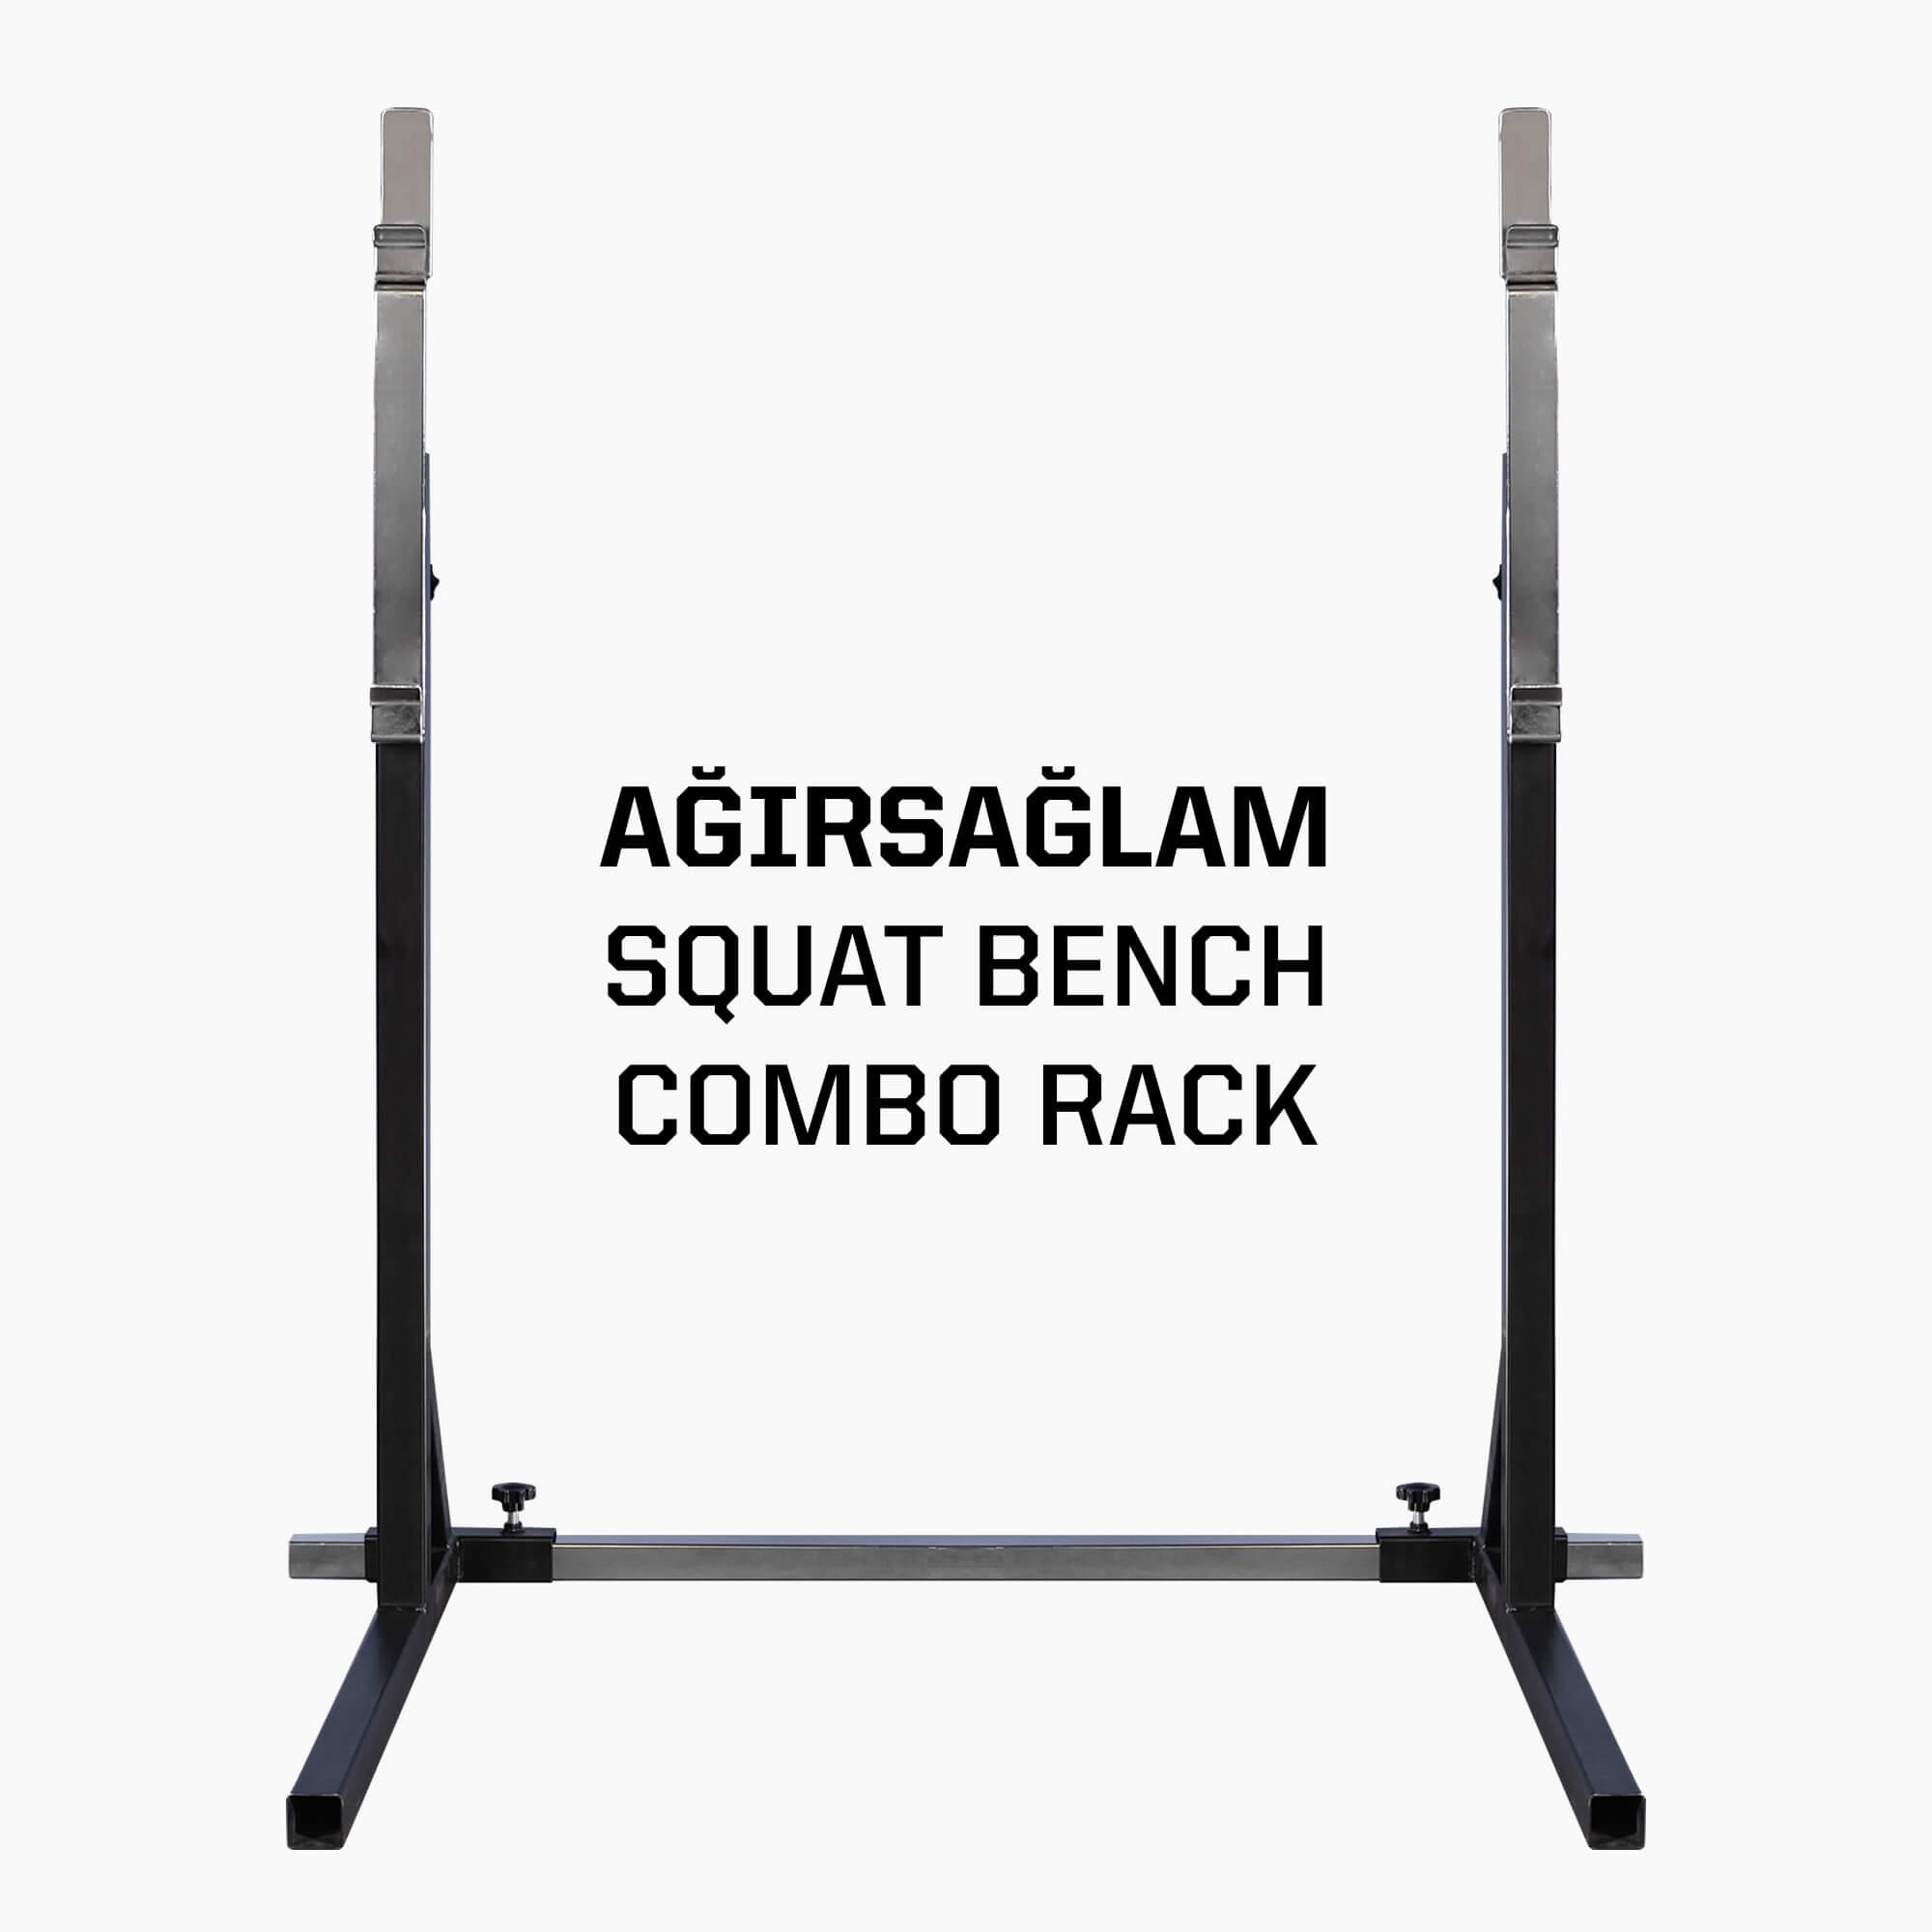 Ağırsağlam Squat Bench Combo Rack